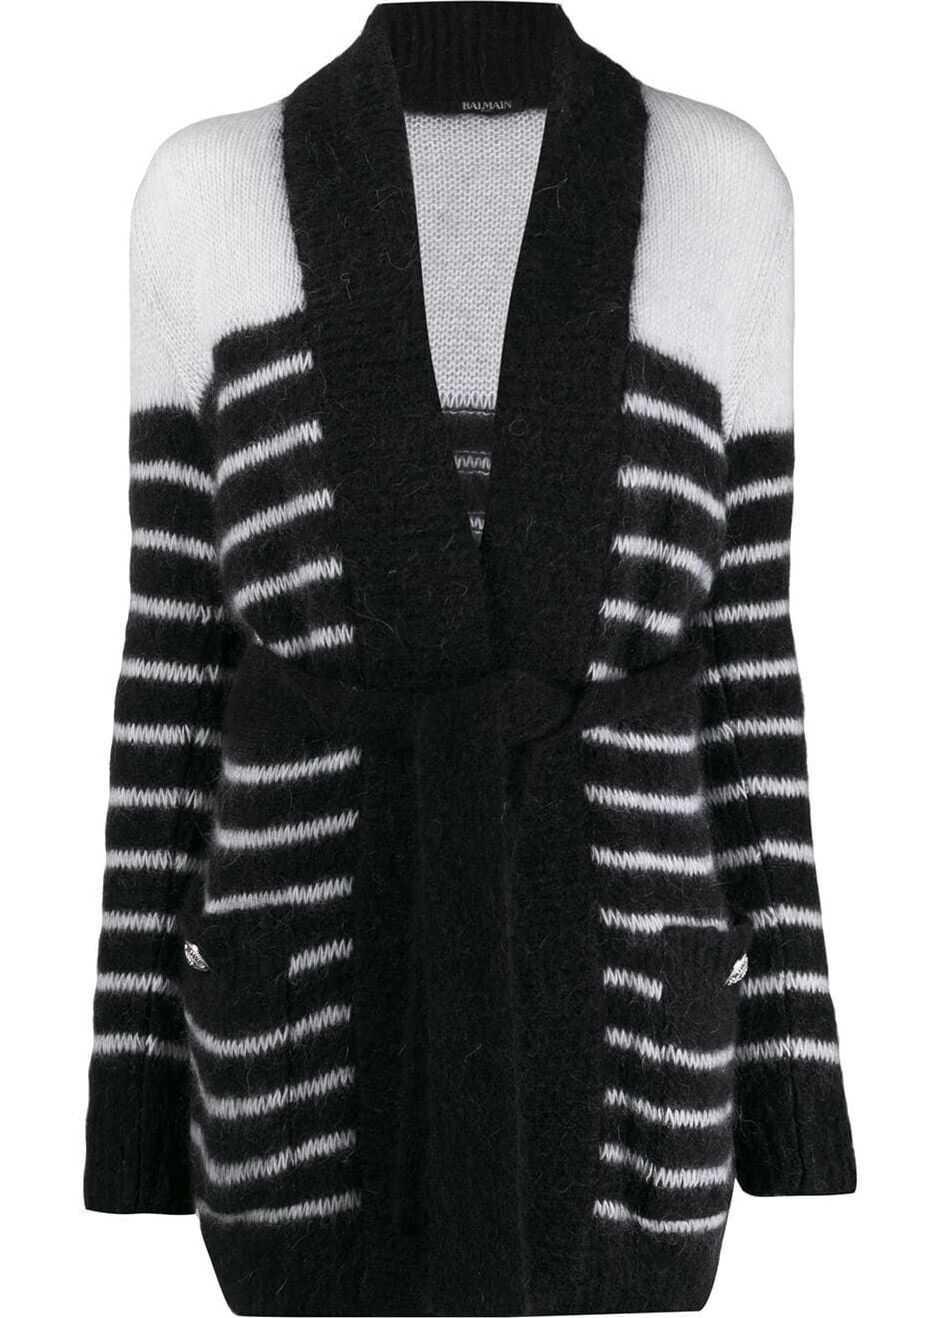 Balmain Wool Cardigan BLACK